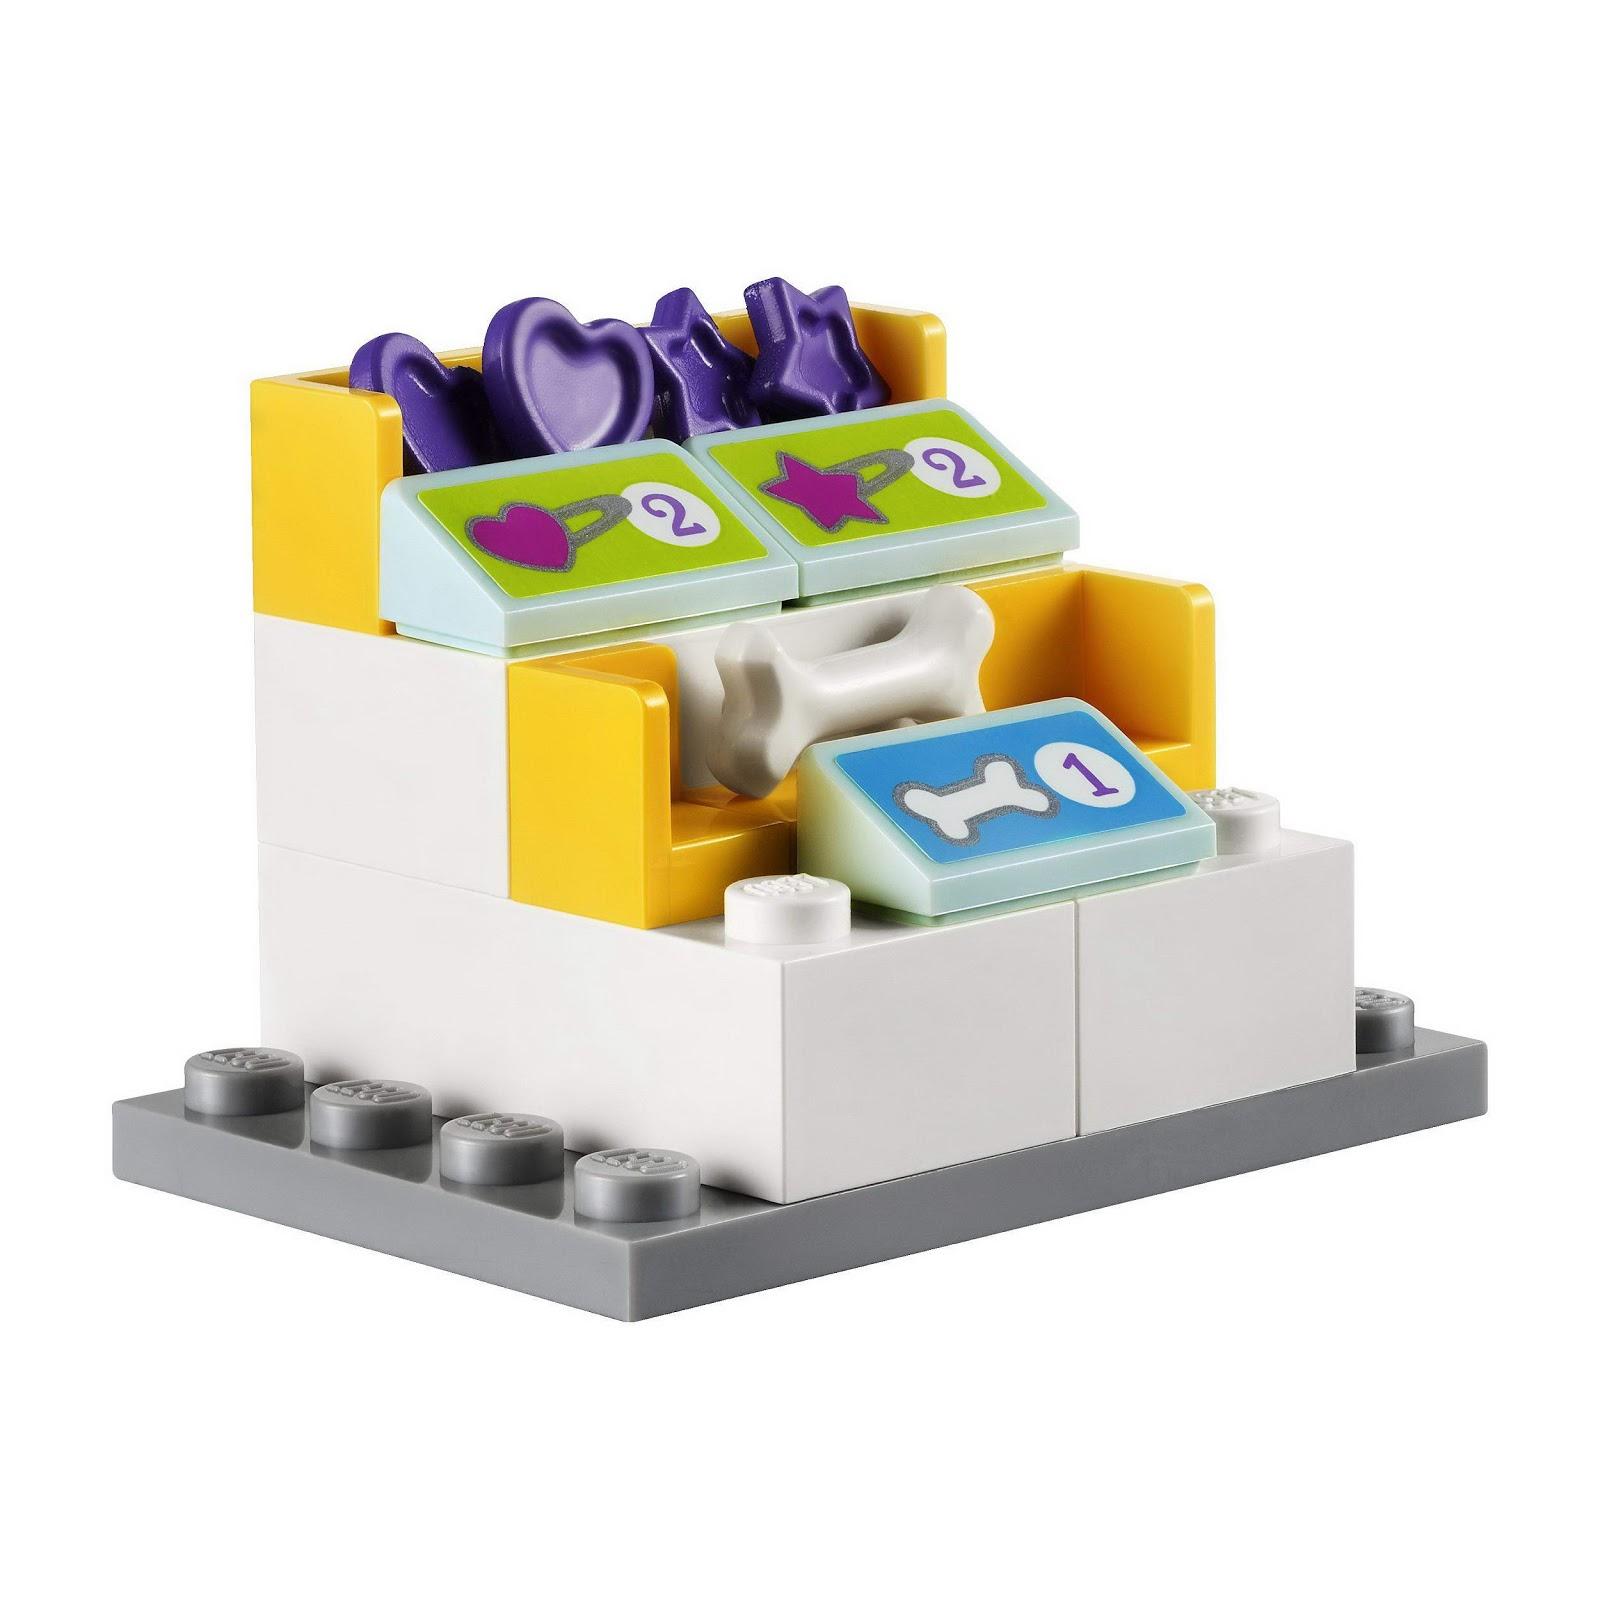 Lego 41007 lego friends heartlake pet salon toymania for Lago shop online